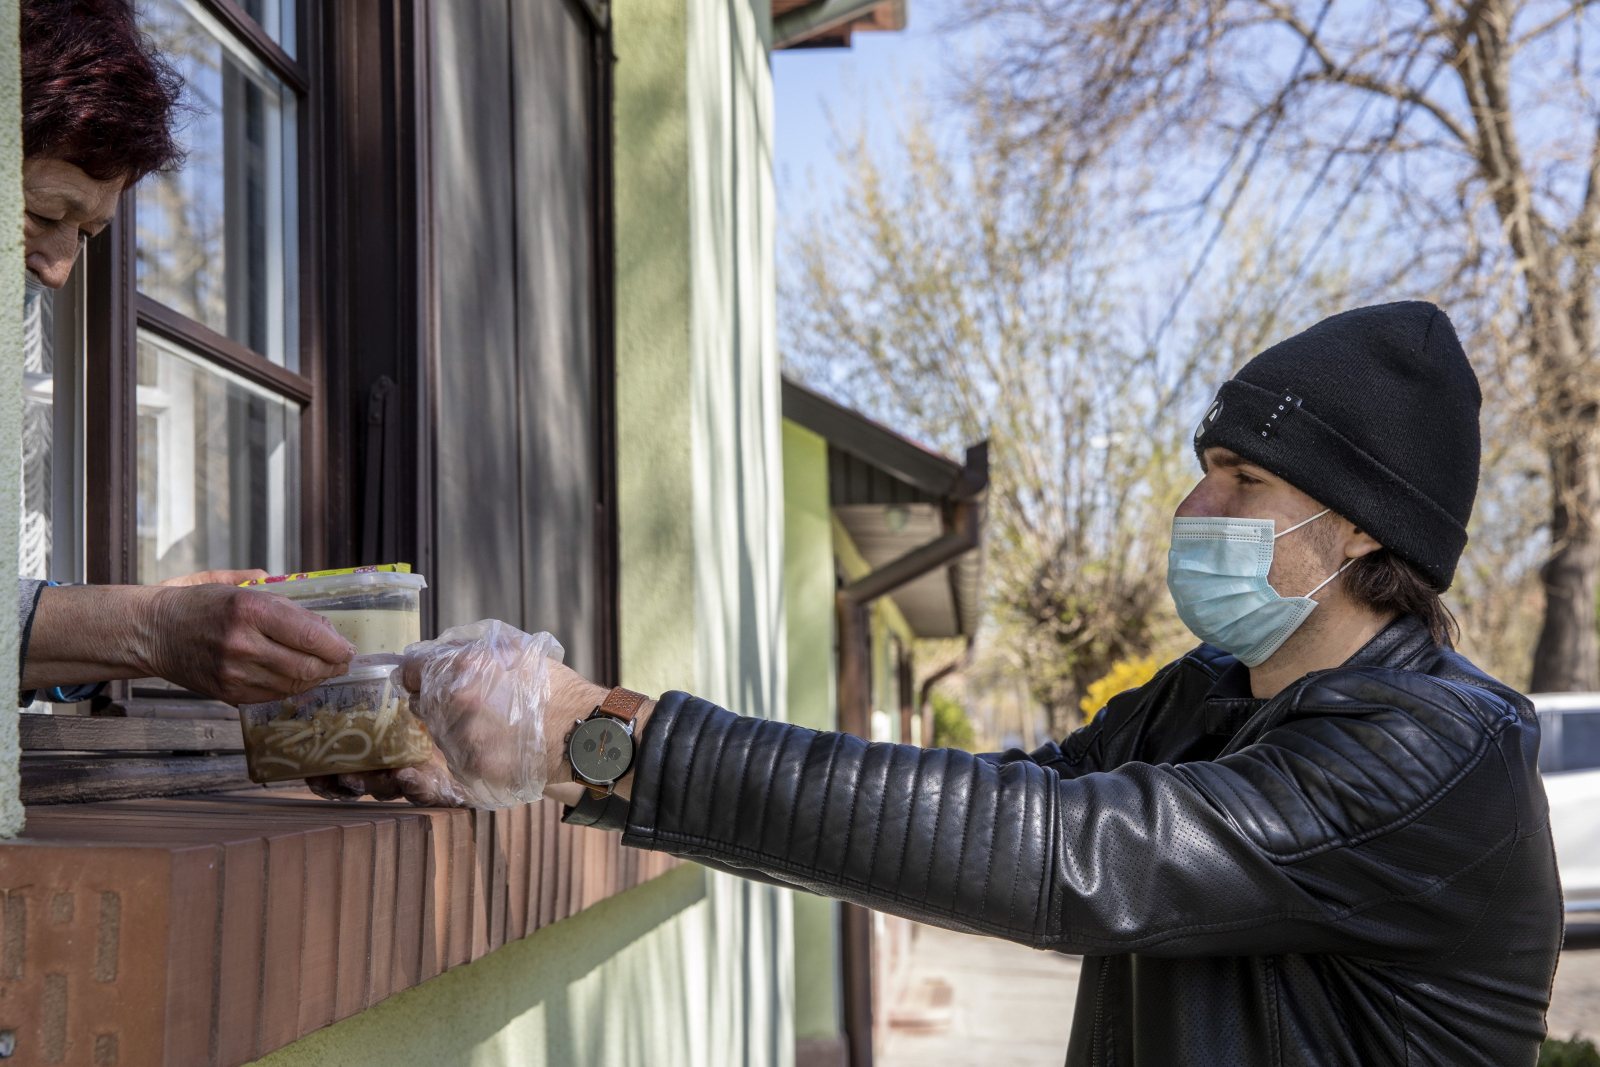 EPA/Tibor Rosta